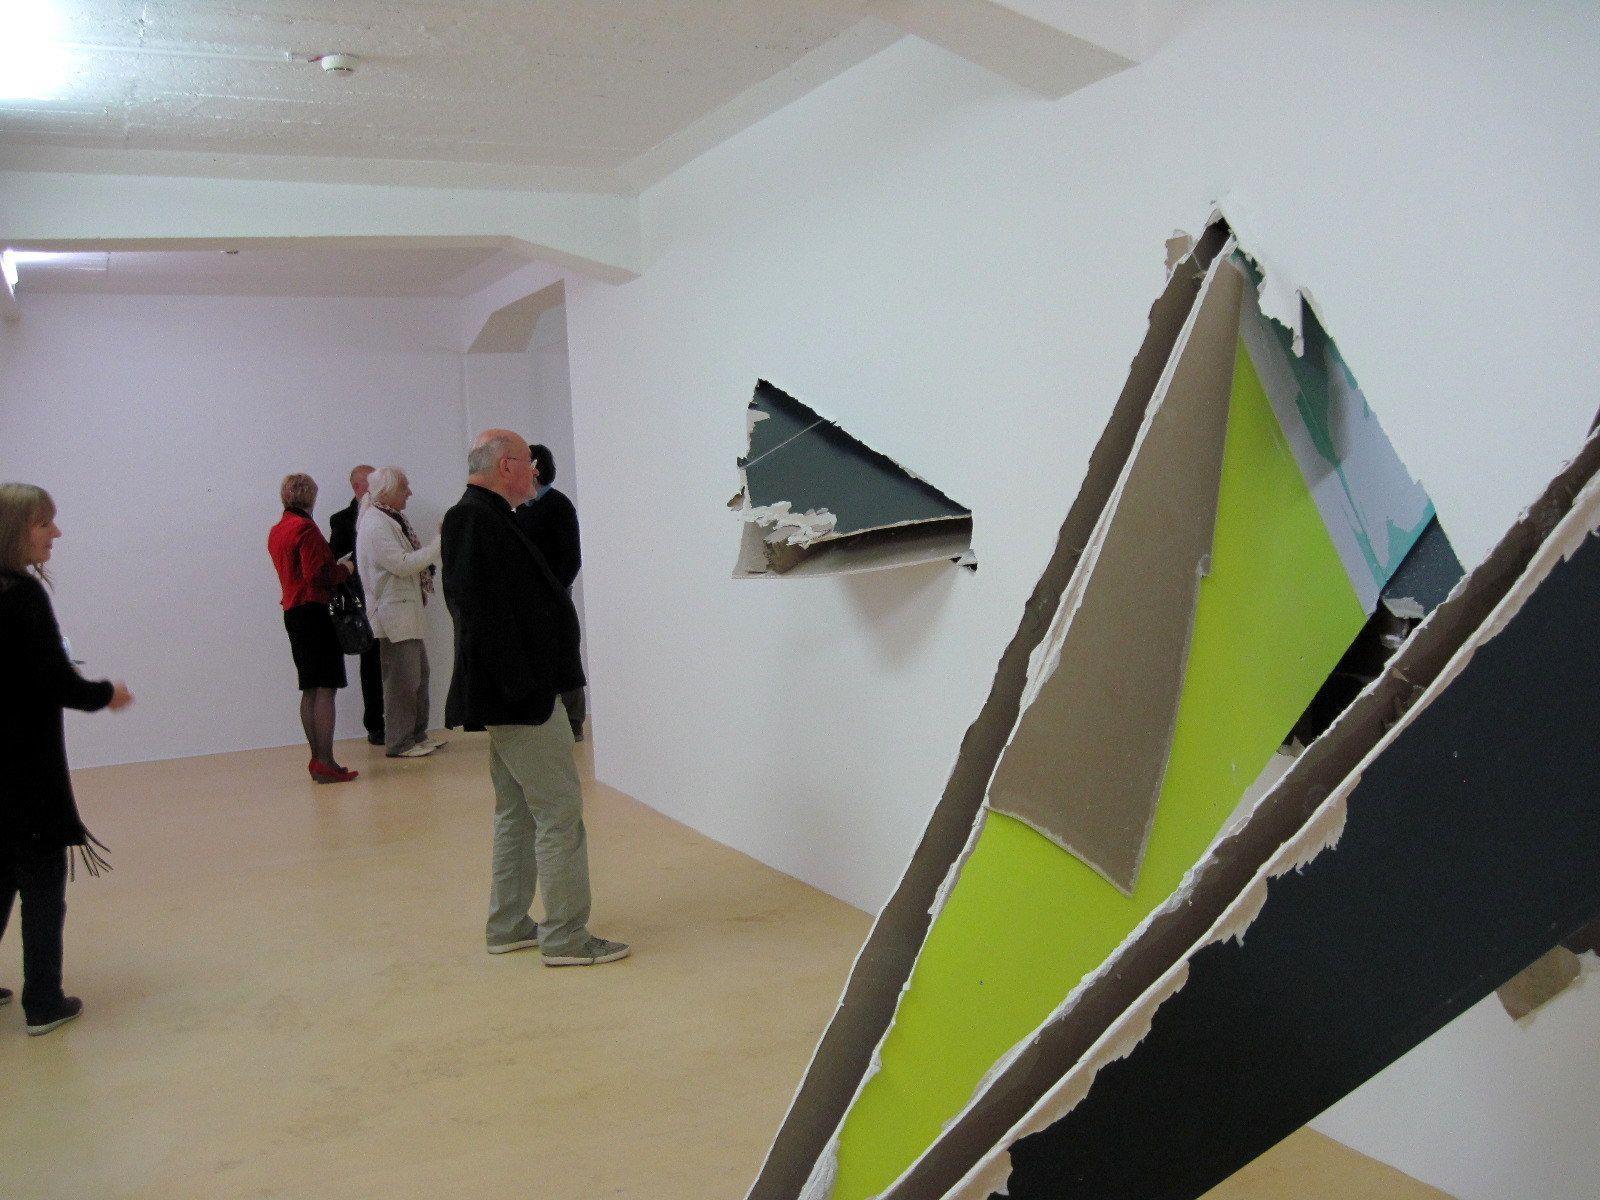 Felix Schramms Skulpturen erinnern an Tranchierarbeiten